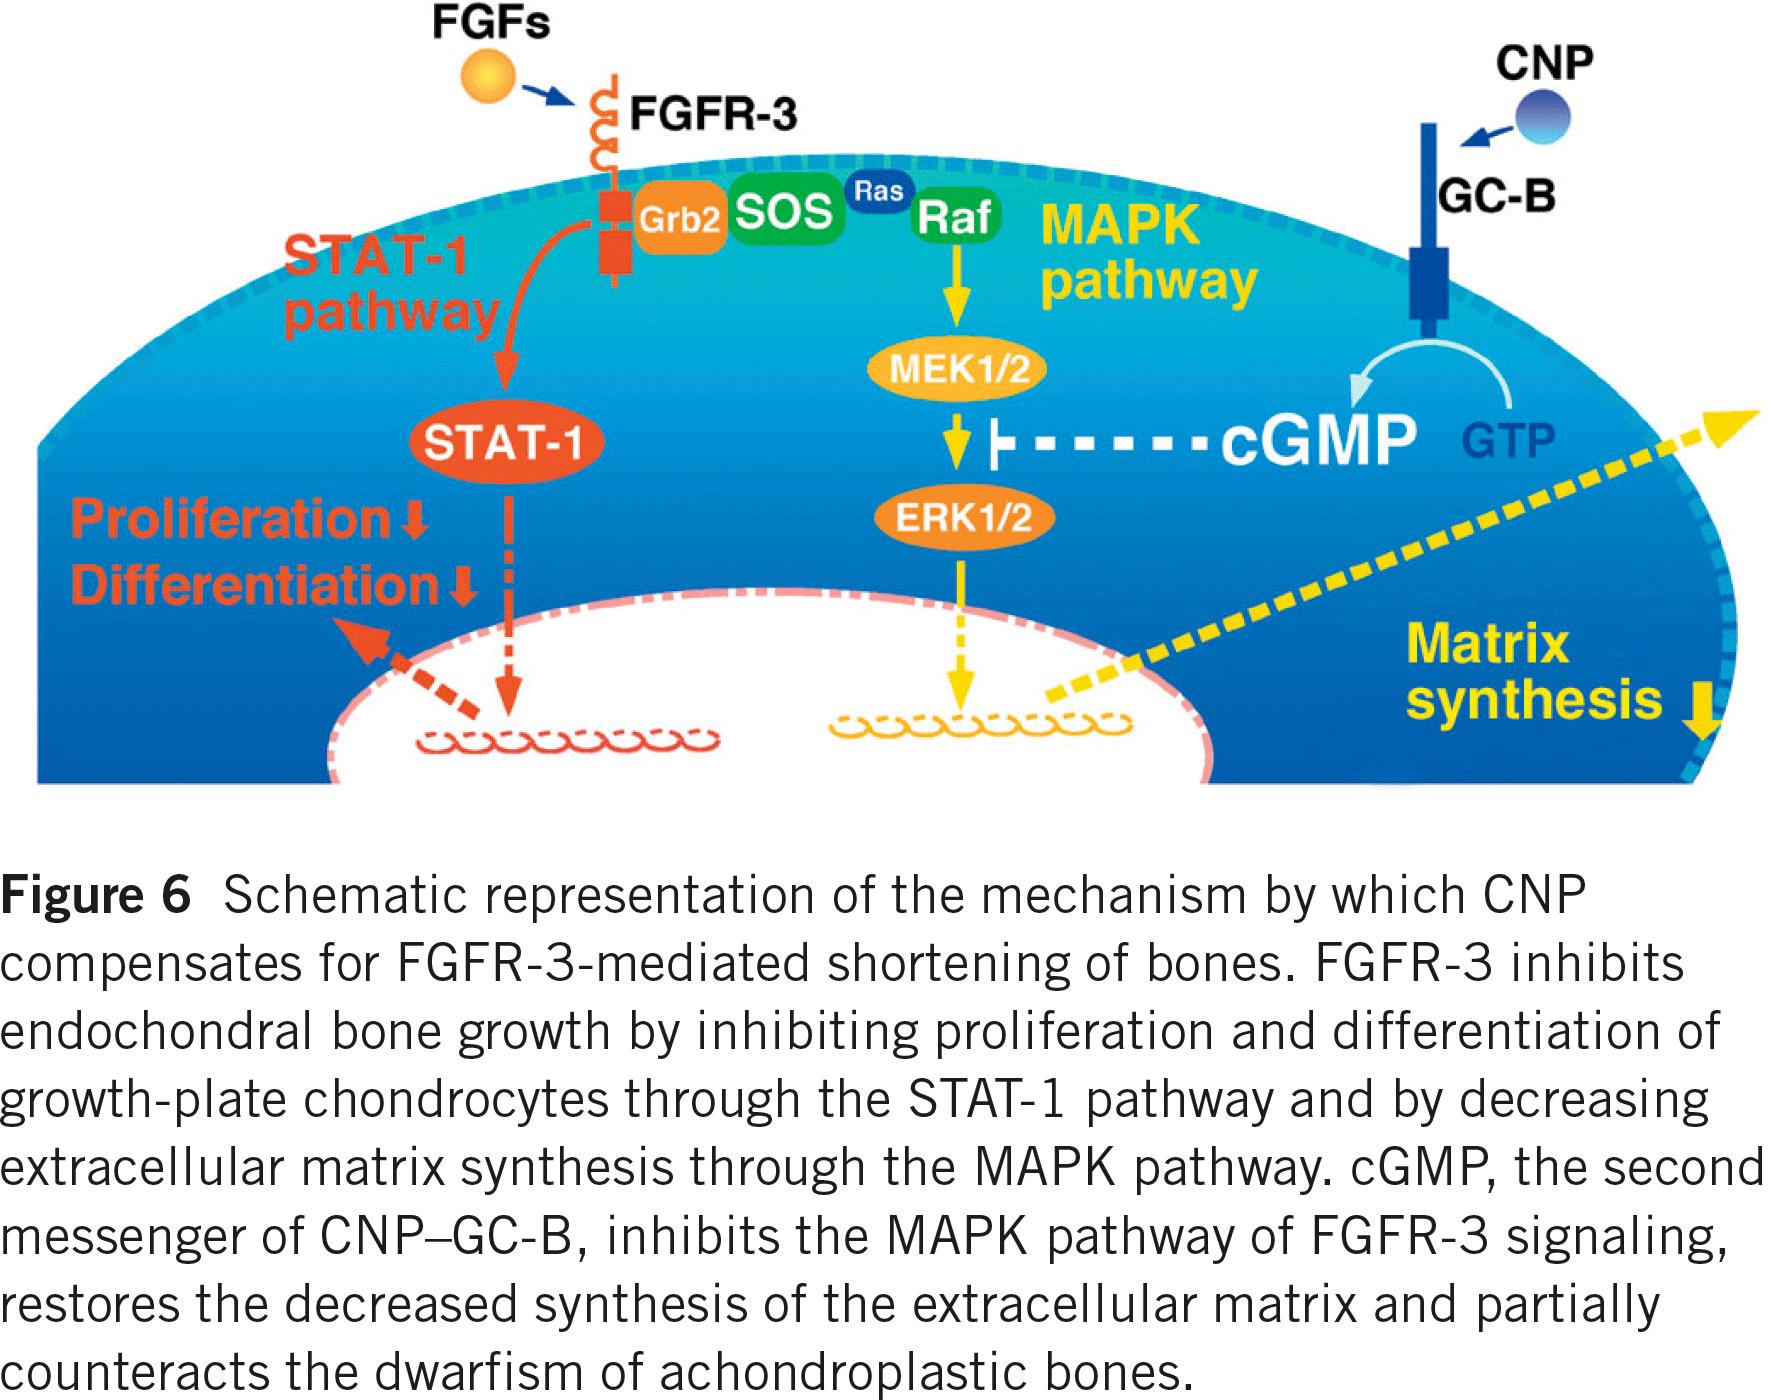 mapk stat1 pathways achondroplasia - Восоритид: первое лекарство против карликовости